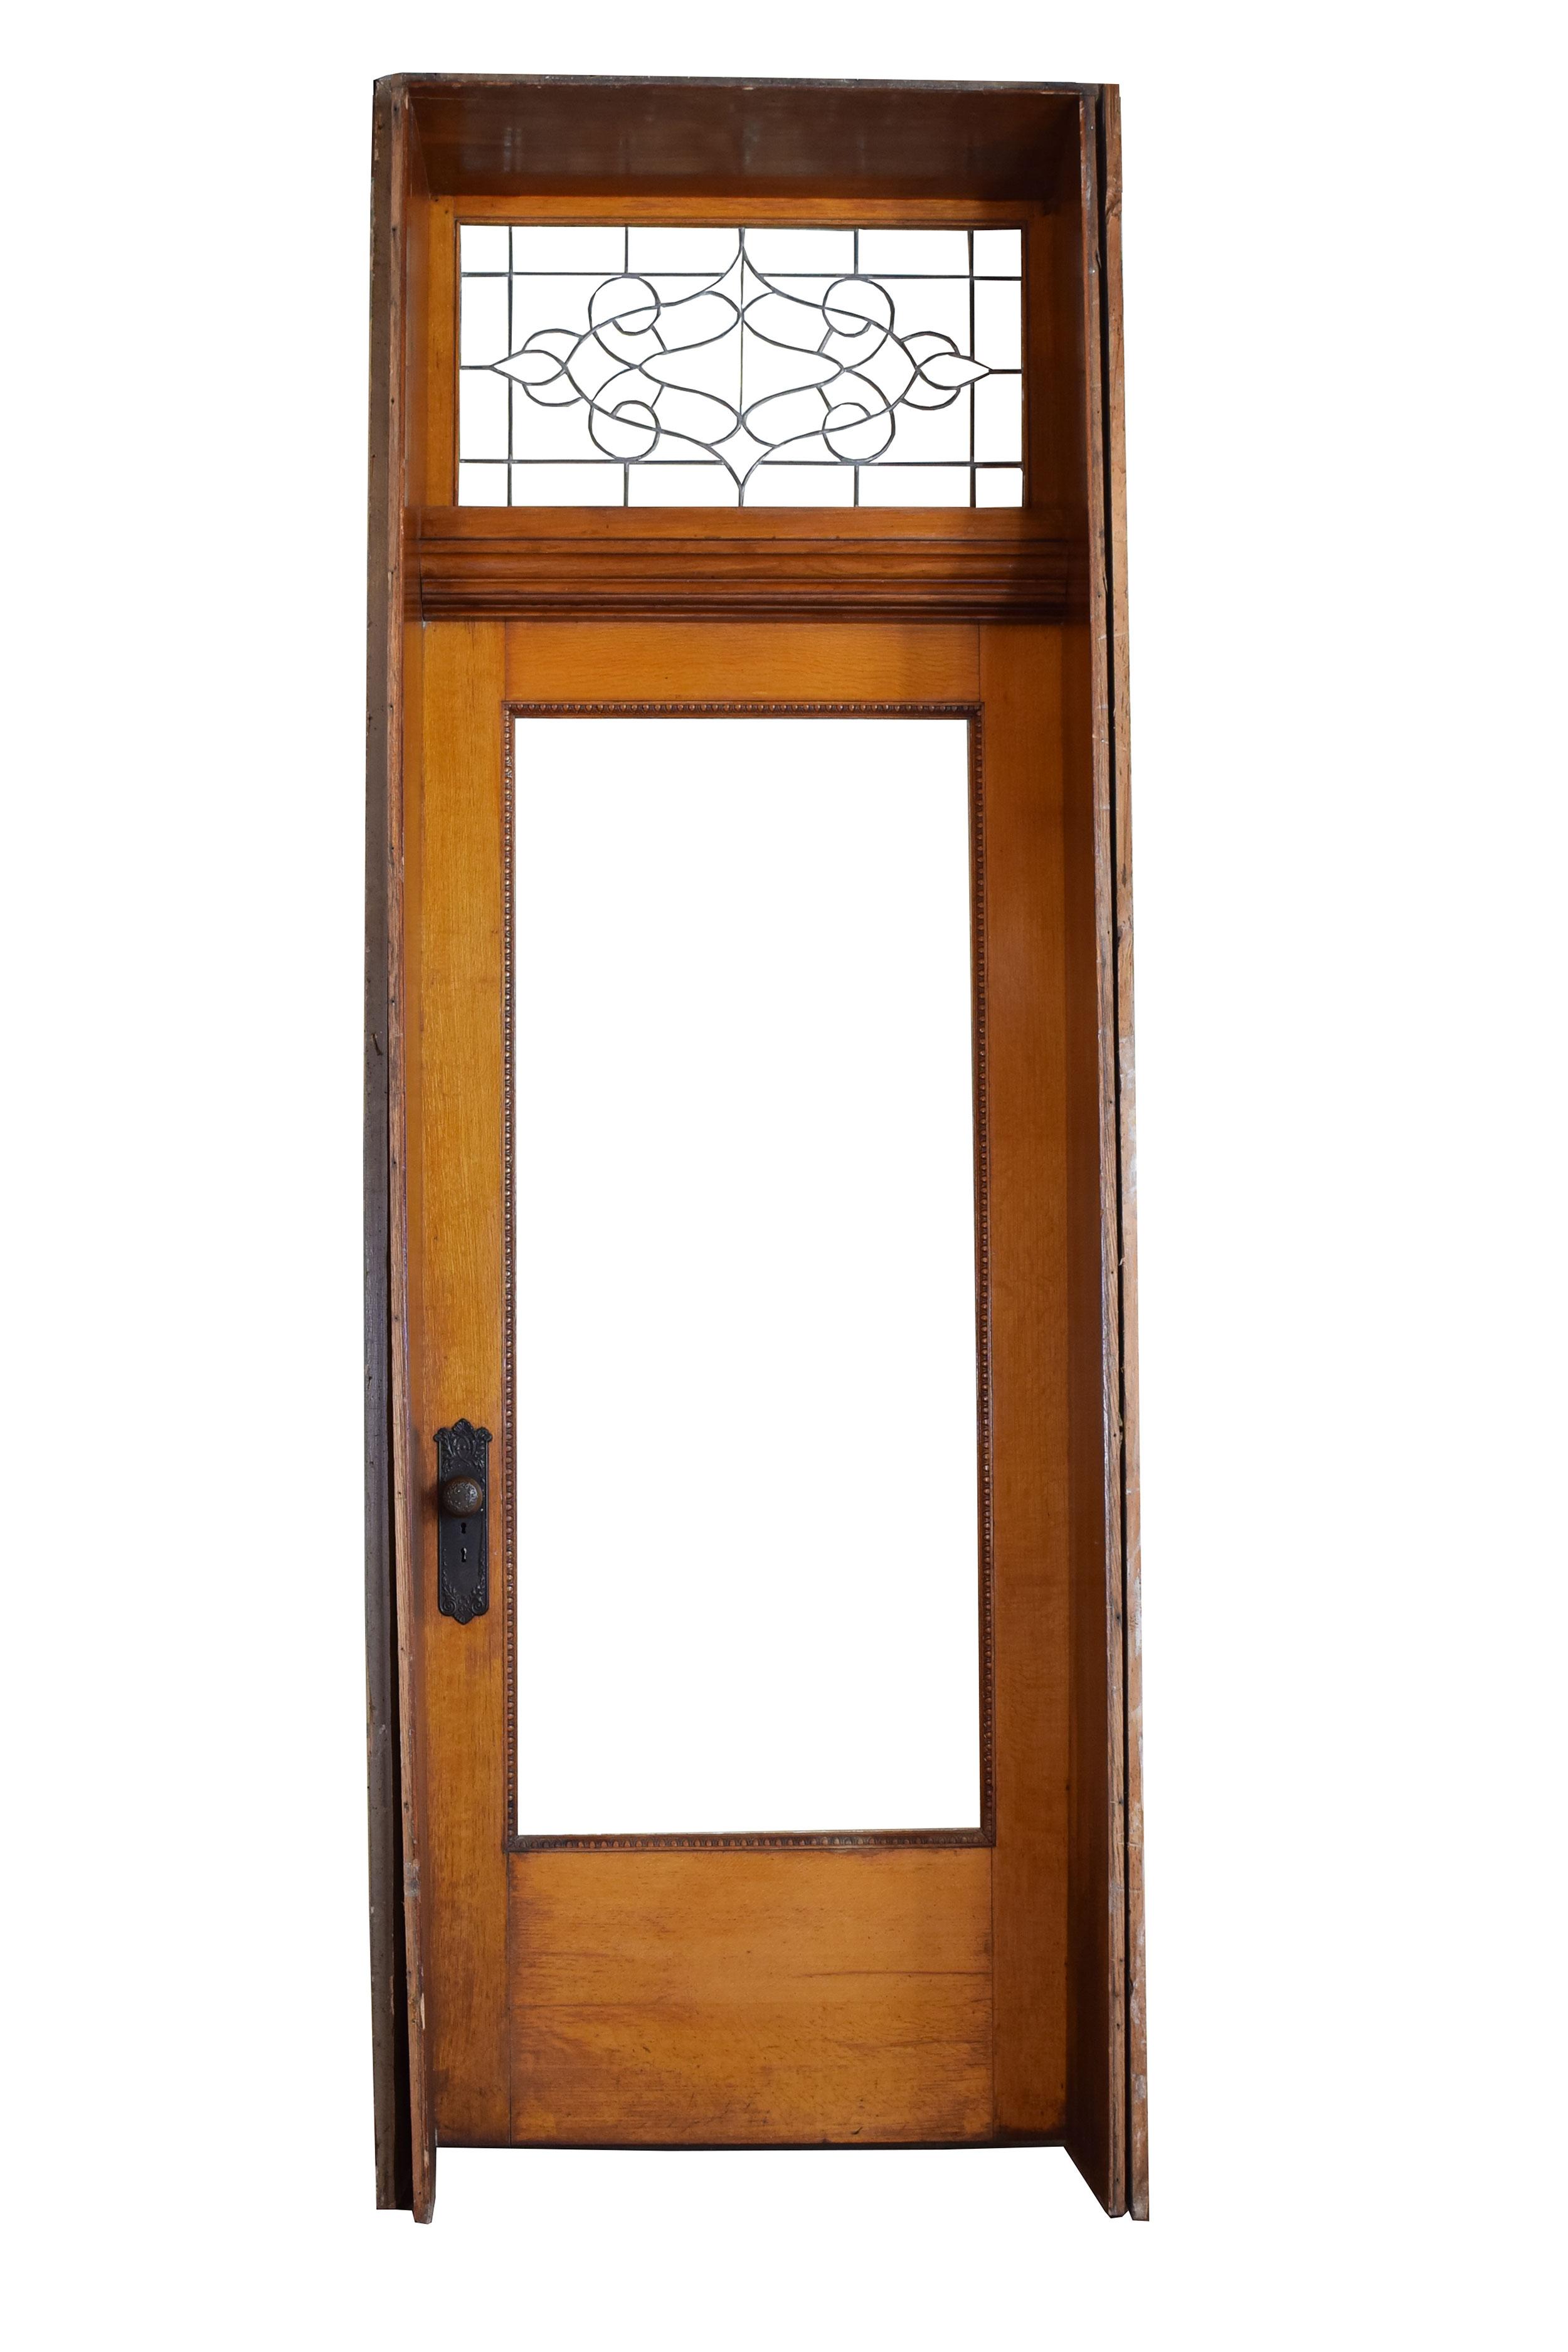 quartersawn oak victorian exterior door with transom